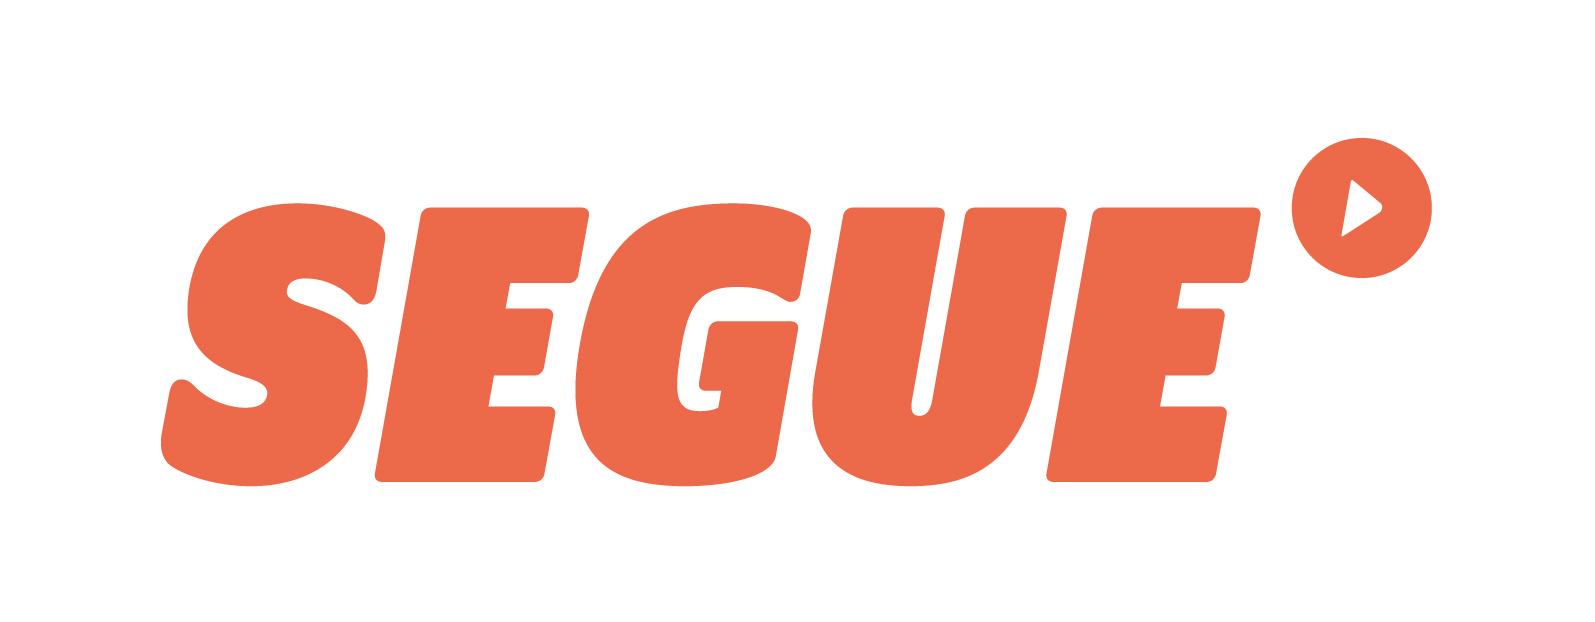 Segue_Primary_Orange Red  Life Career